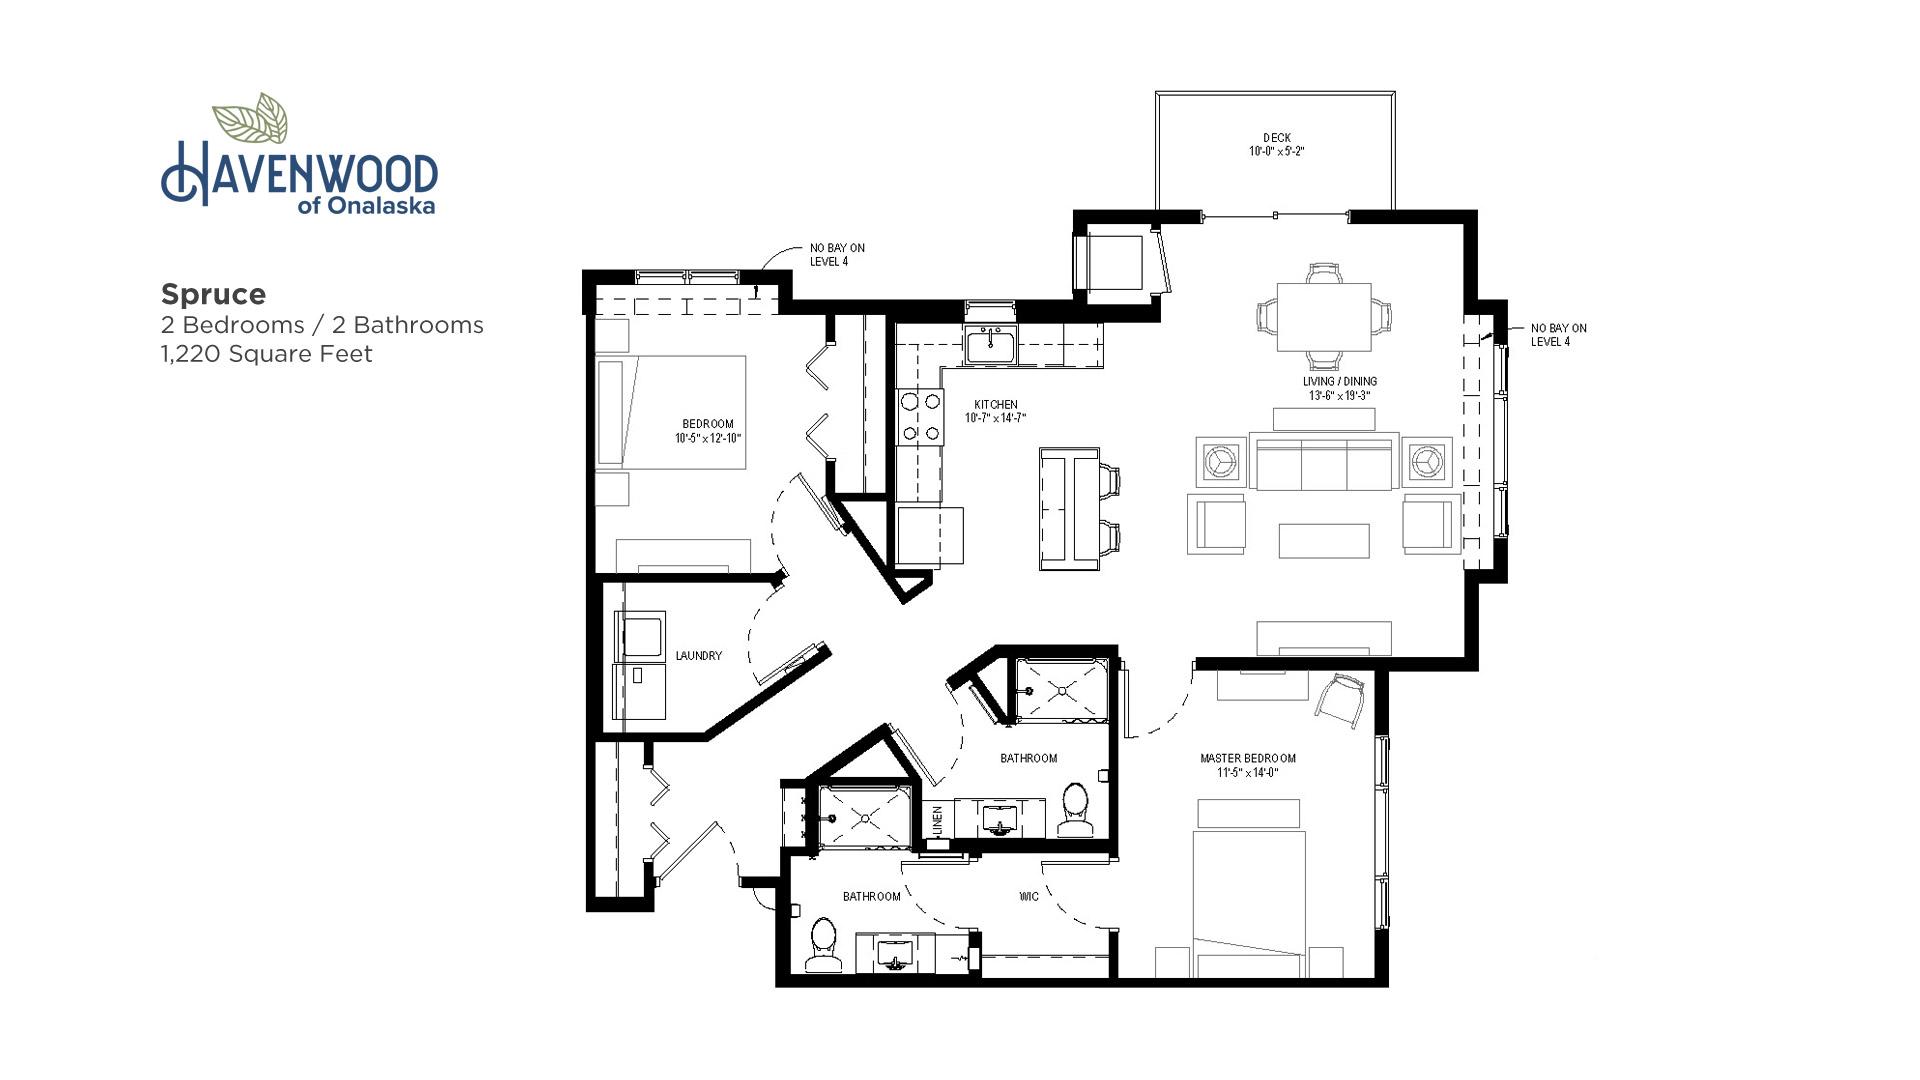 Havenwood of Onalaska Spruce Floor Plan